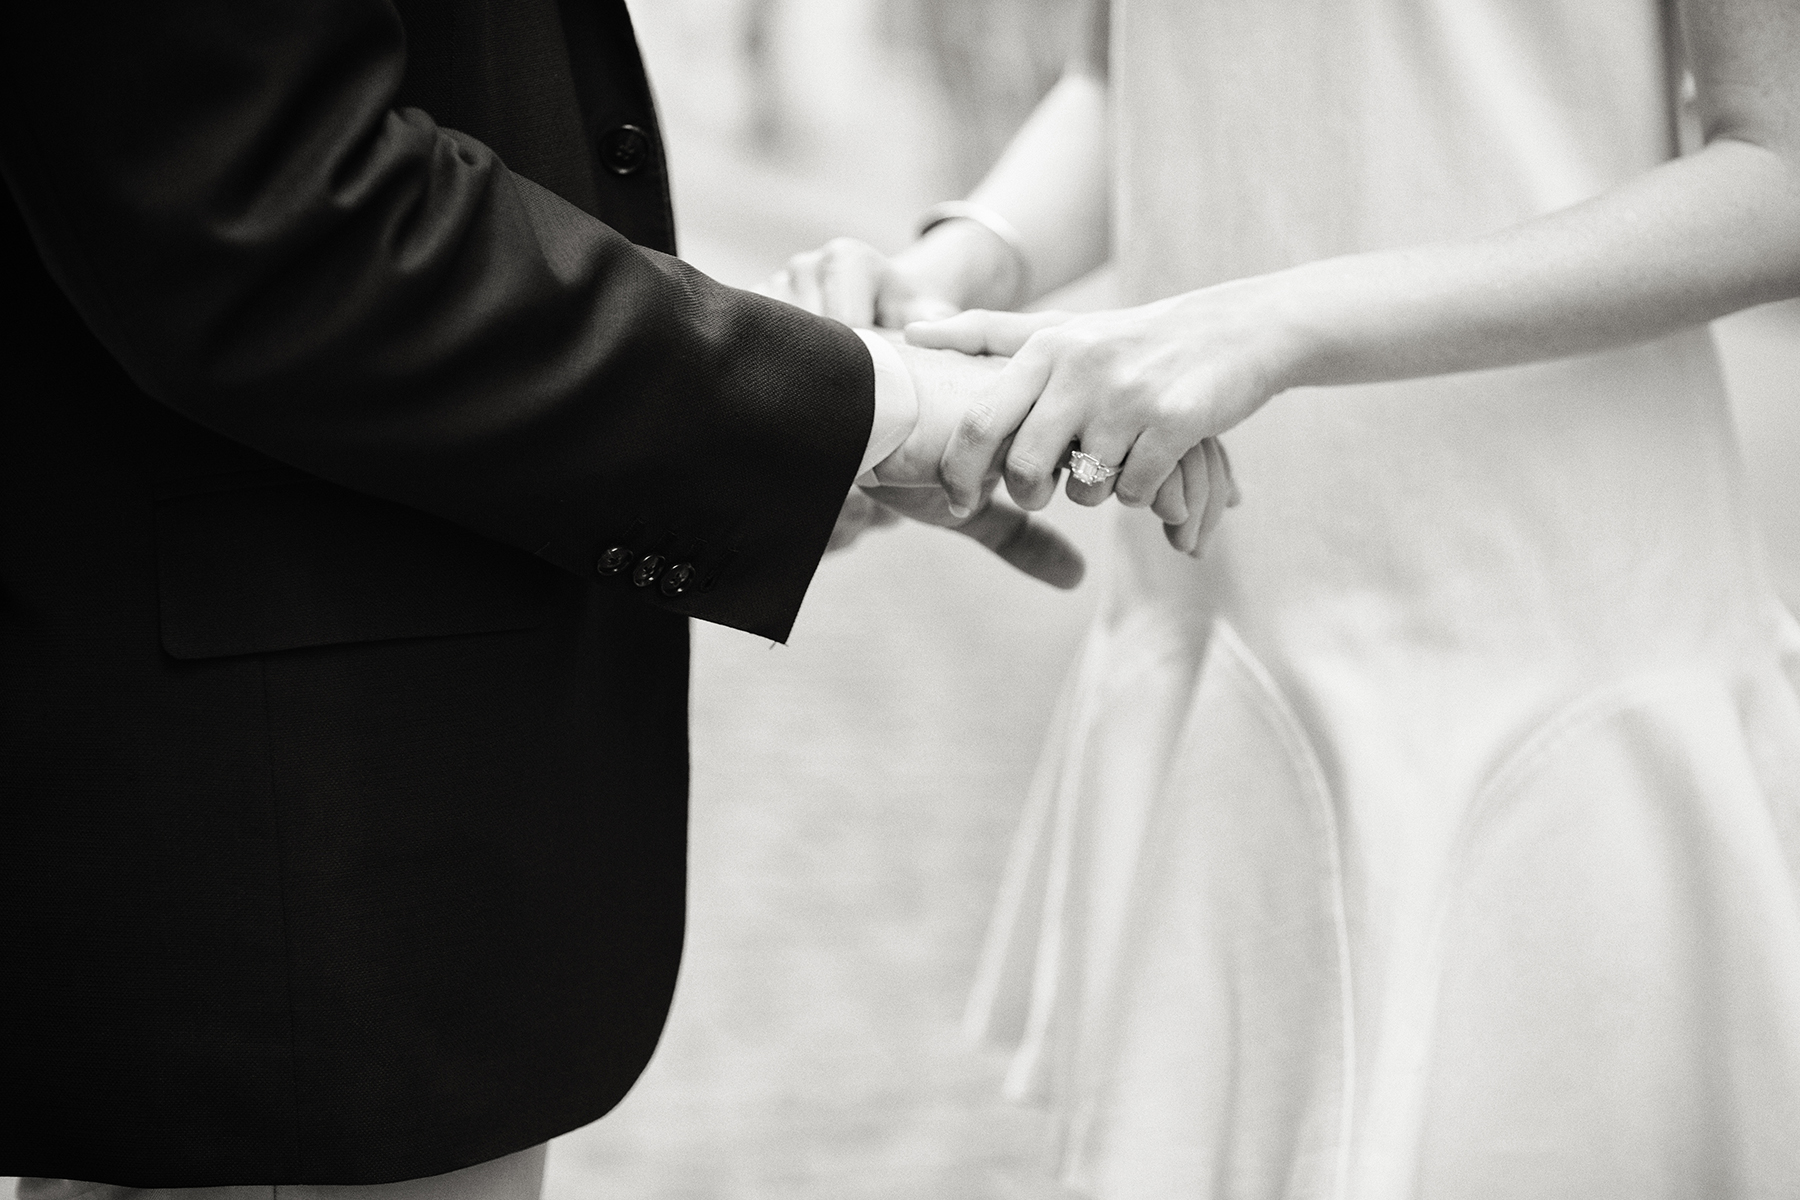 raquelreis_wedding_photography_engagements_003.jpg